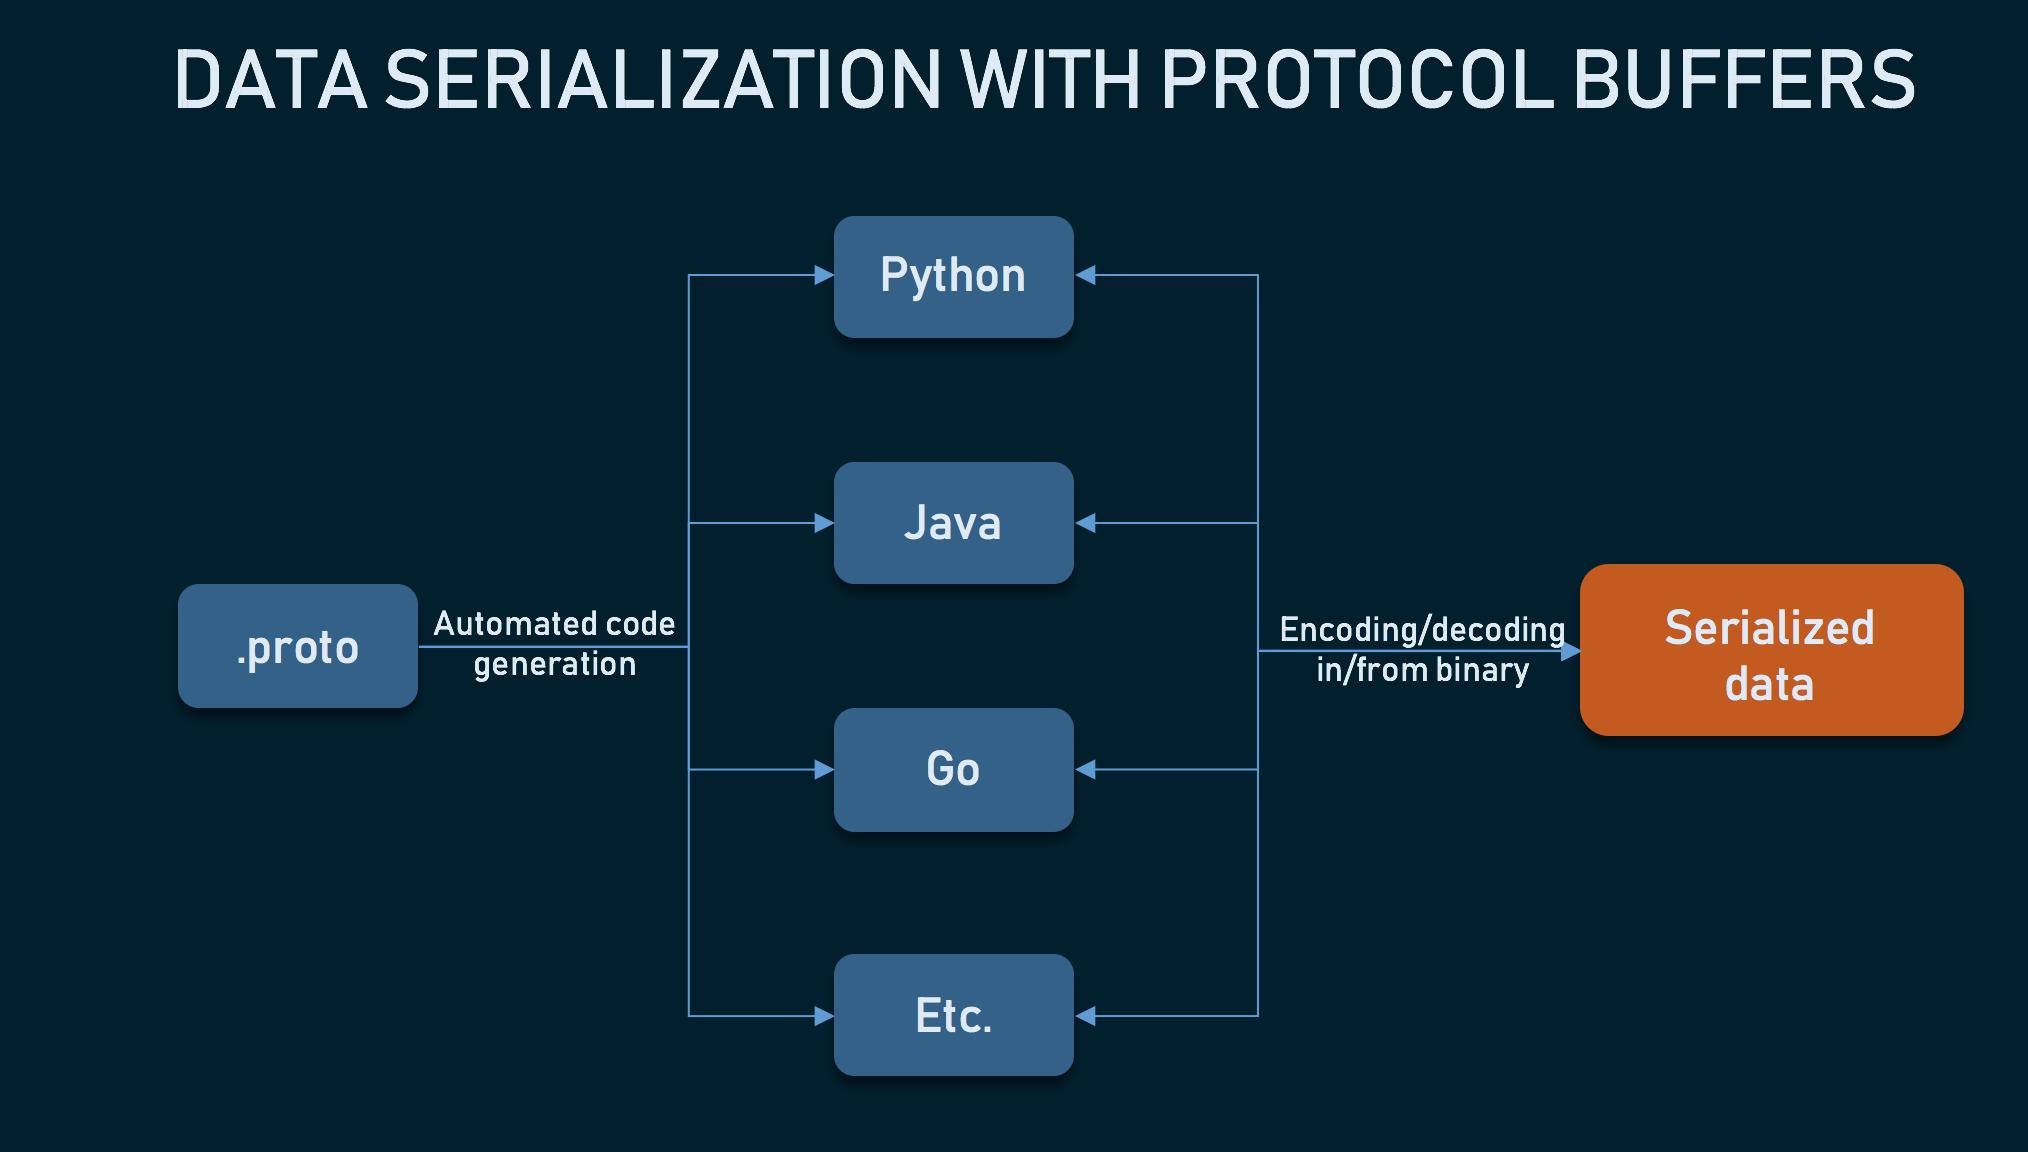 Protocol buffers